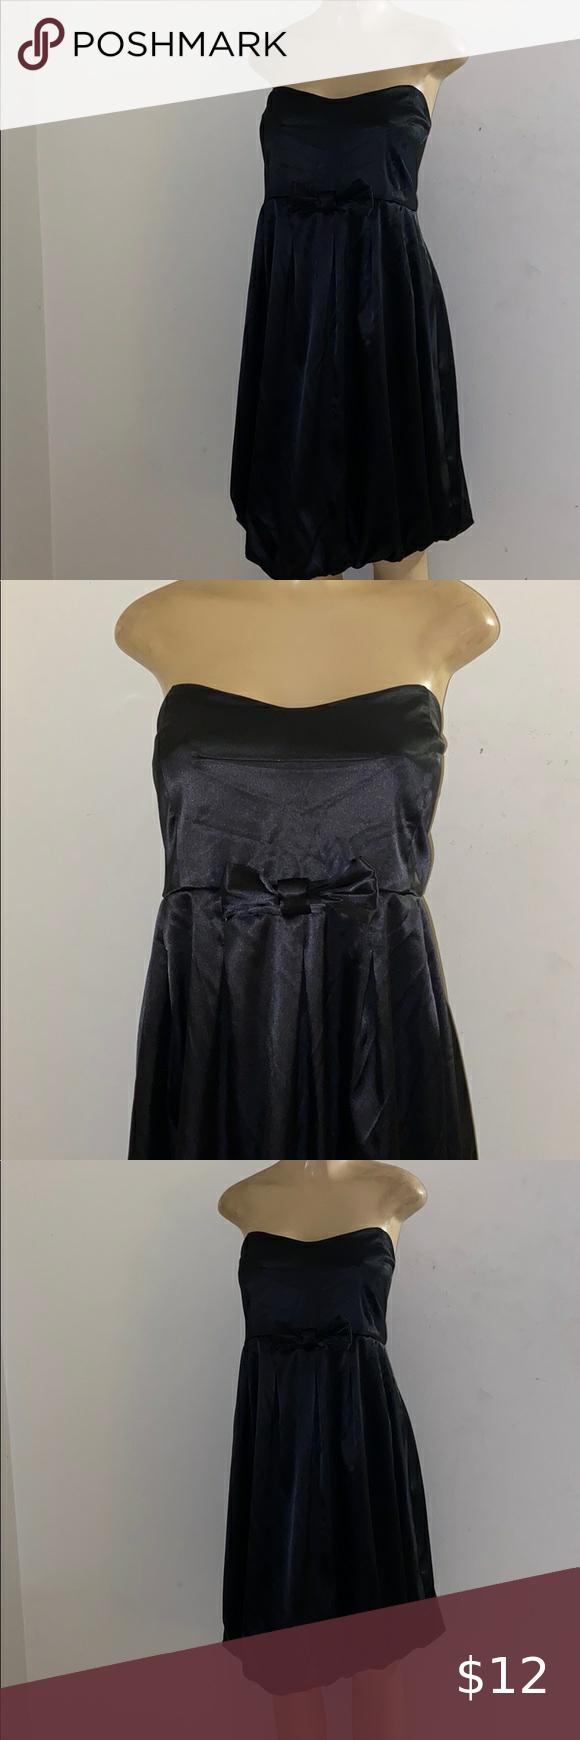 Ruby Rox Plus Size 16 18 Black Dress Sleeveless Black Sleeveless Dress Black Dress Size 18 Dress [ 1740 x 580 Pixel ]